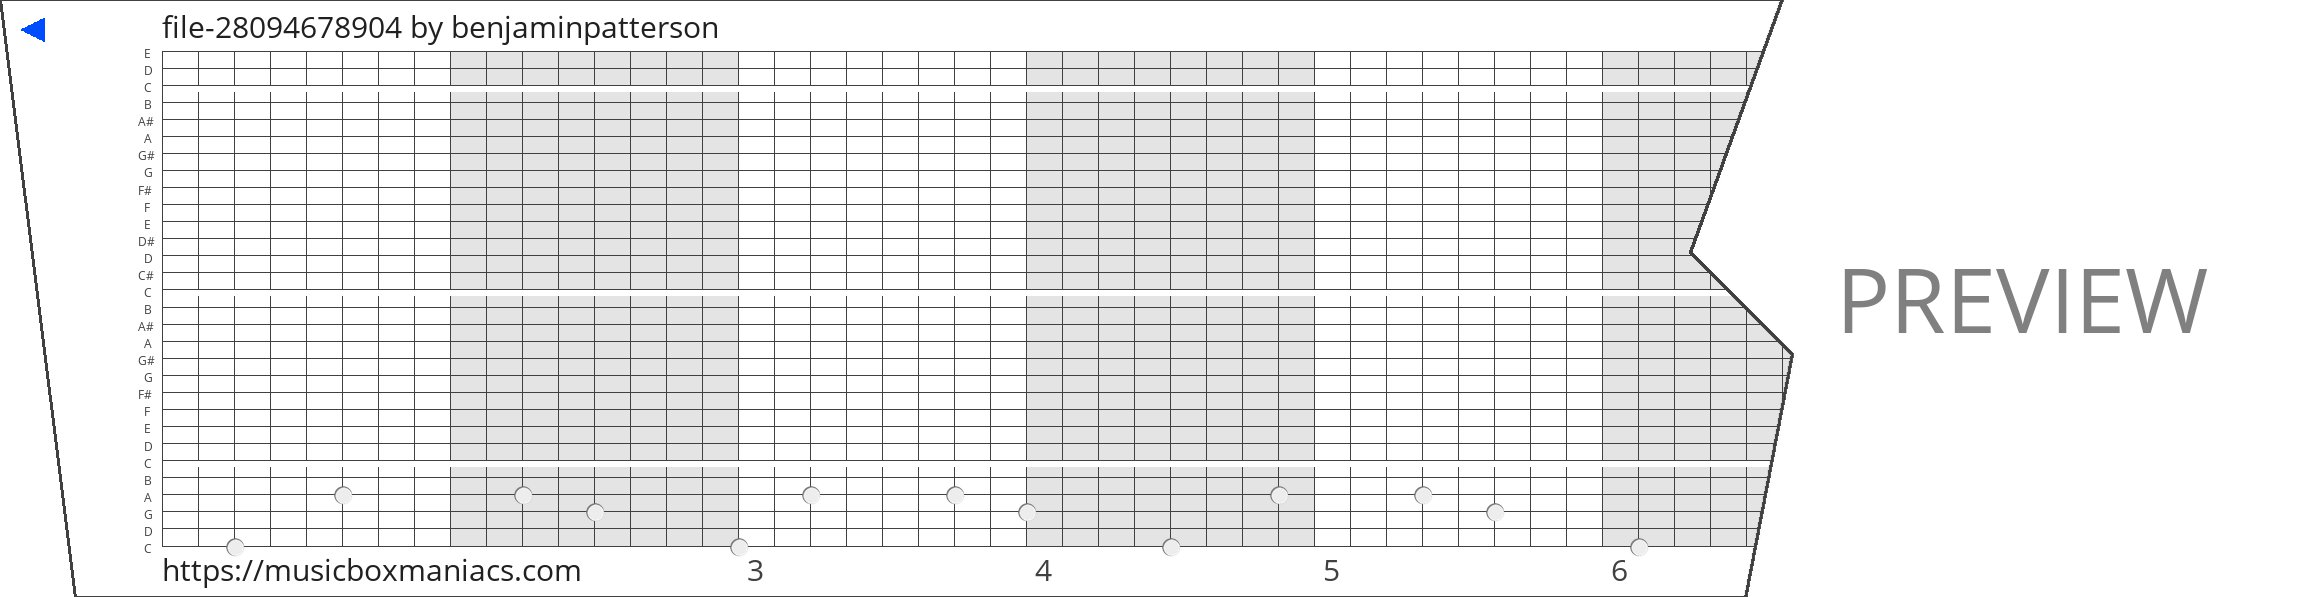 file-28094678904 30 note music box paper strip